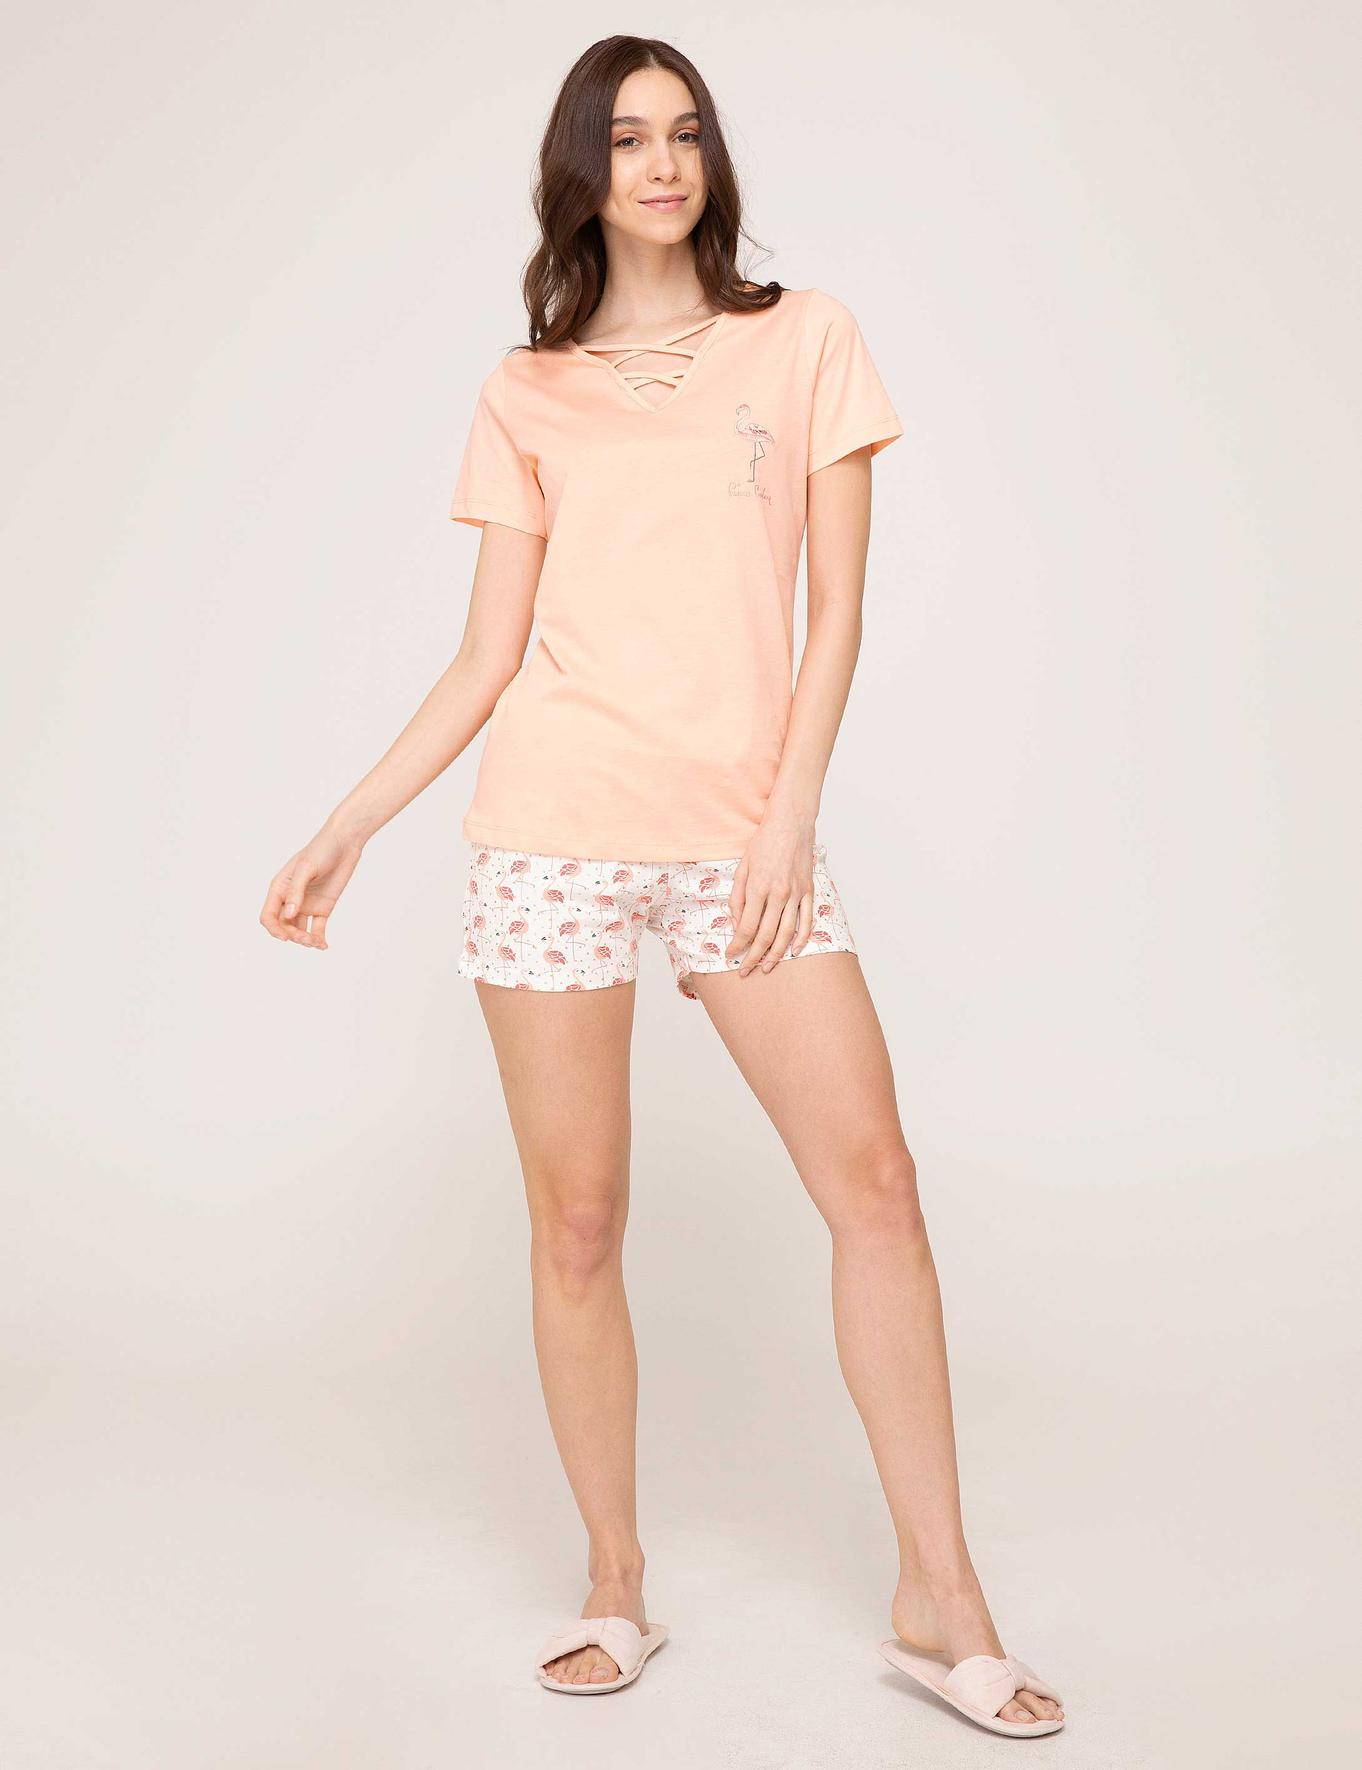 Turuncu Şortlu Pijama Takımı